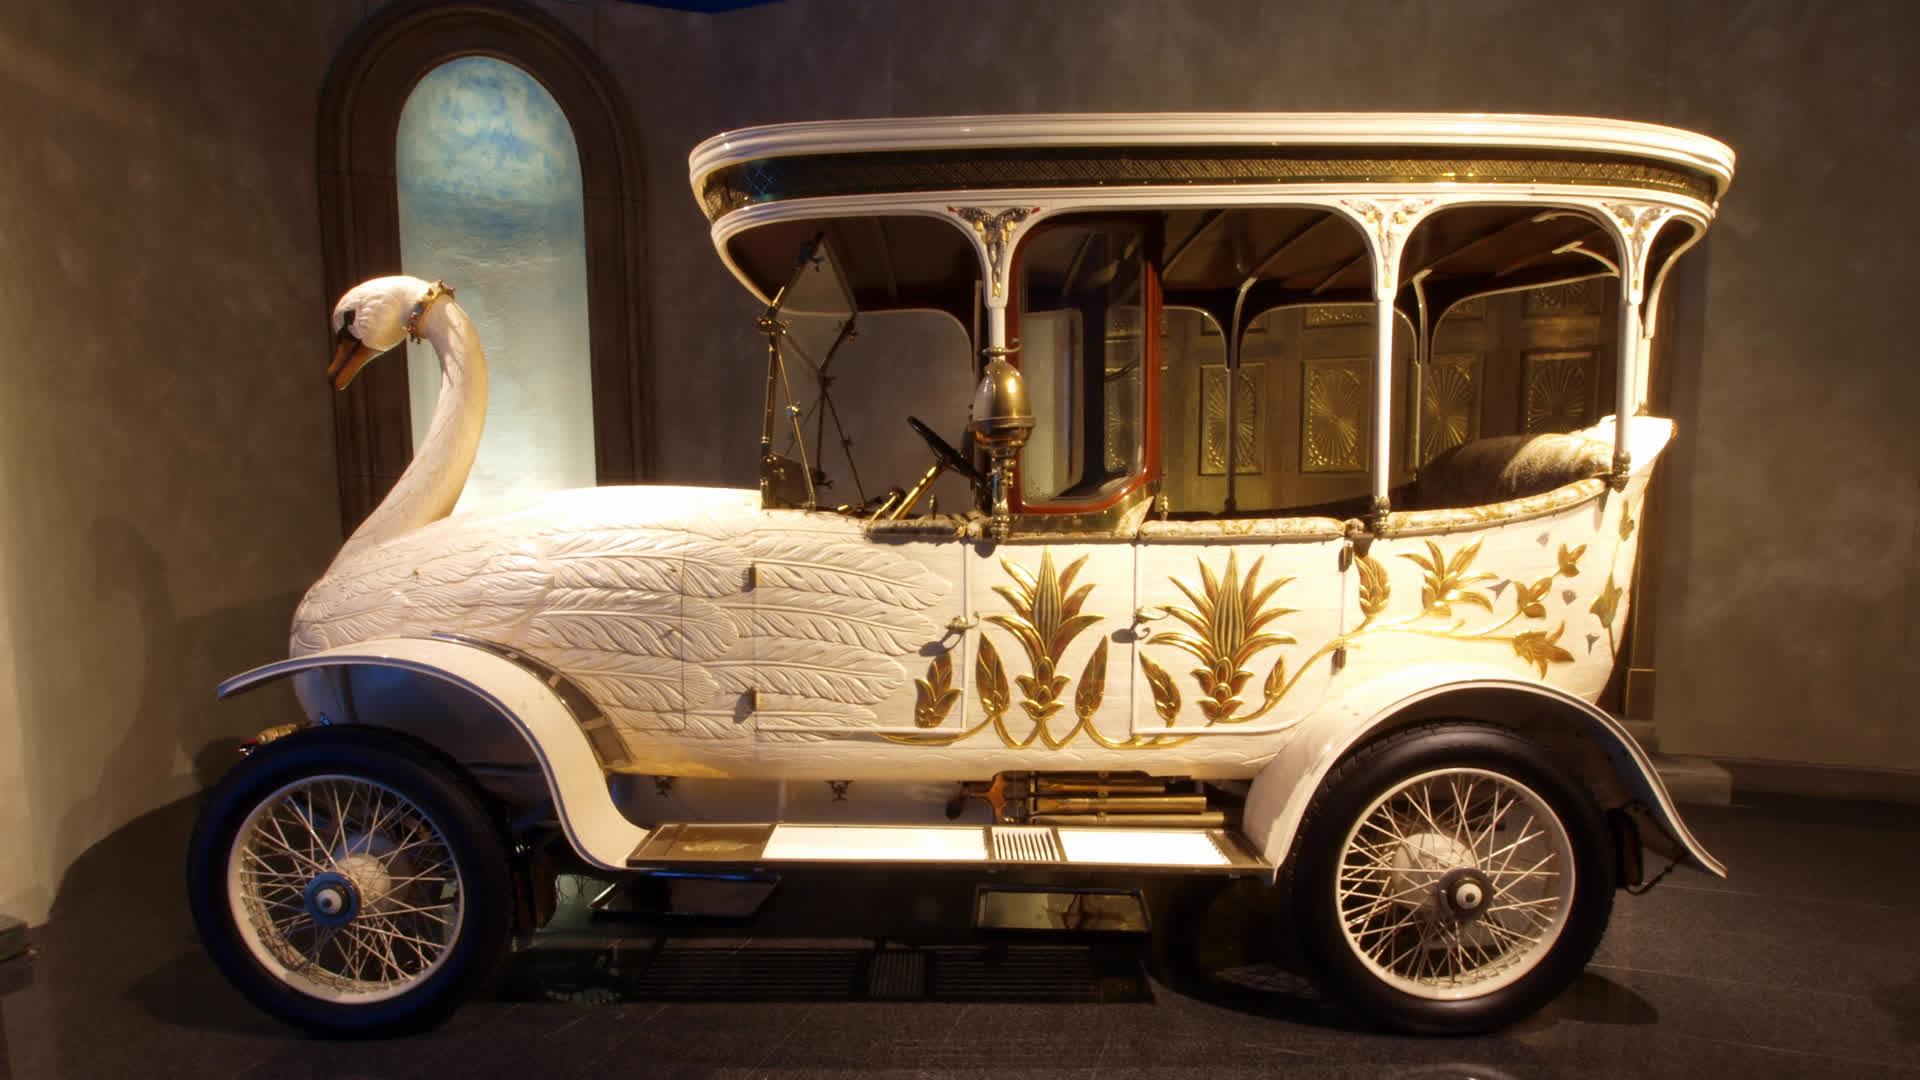 Swan Car: Bizarre, Weird…or Just Quirky?